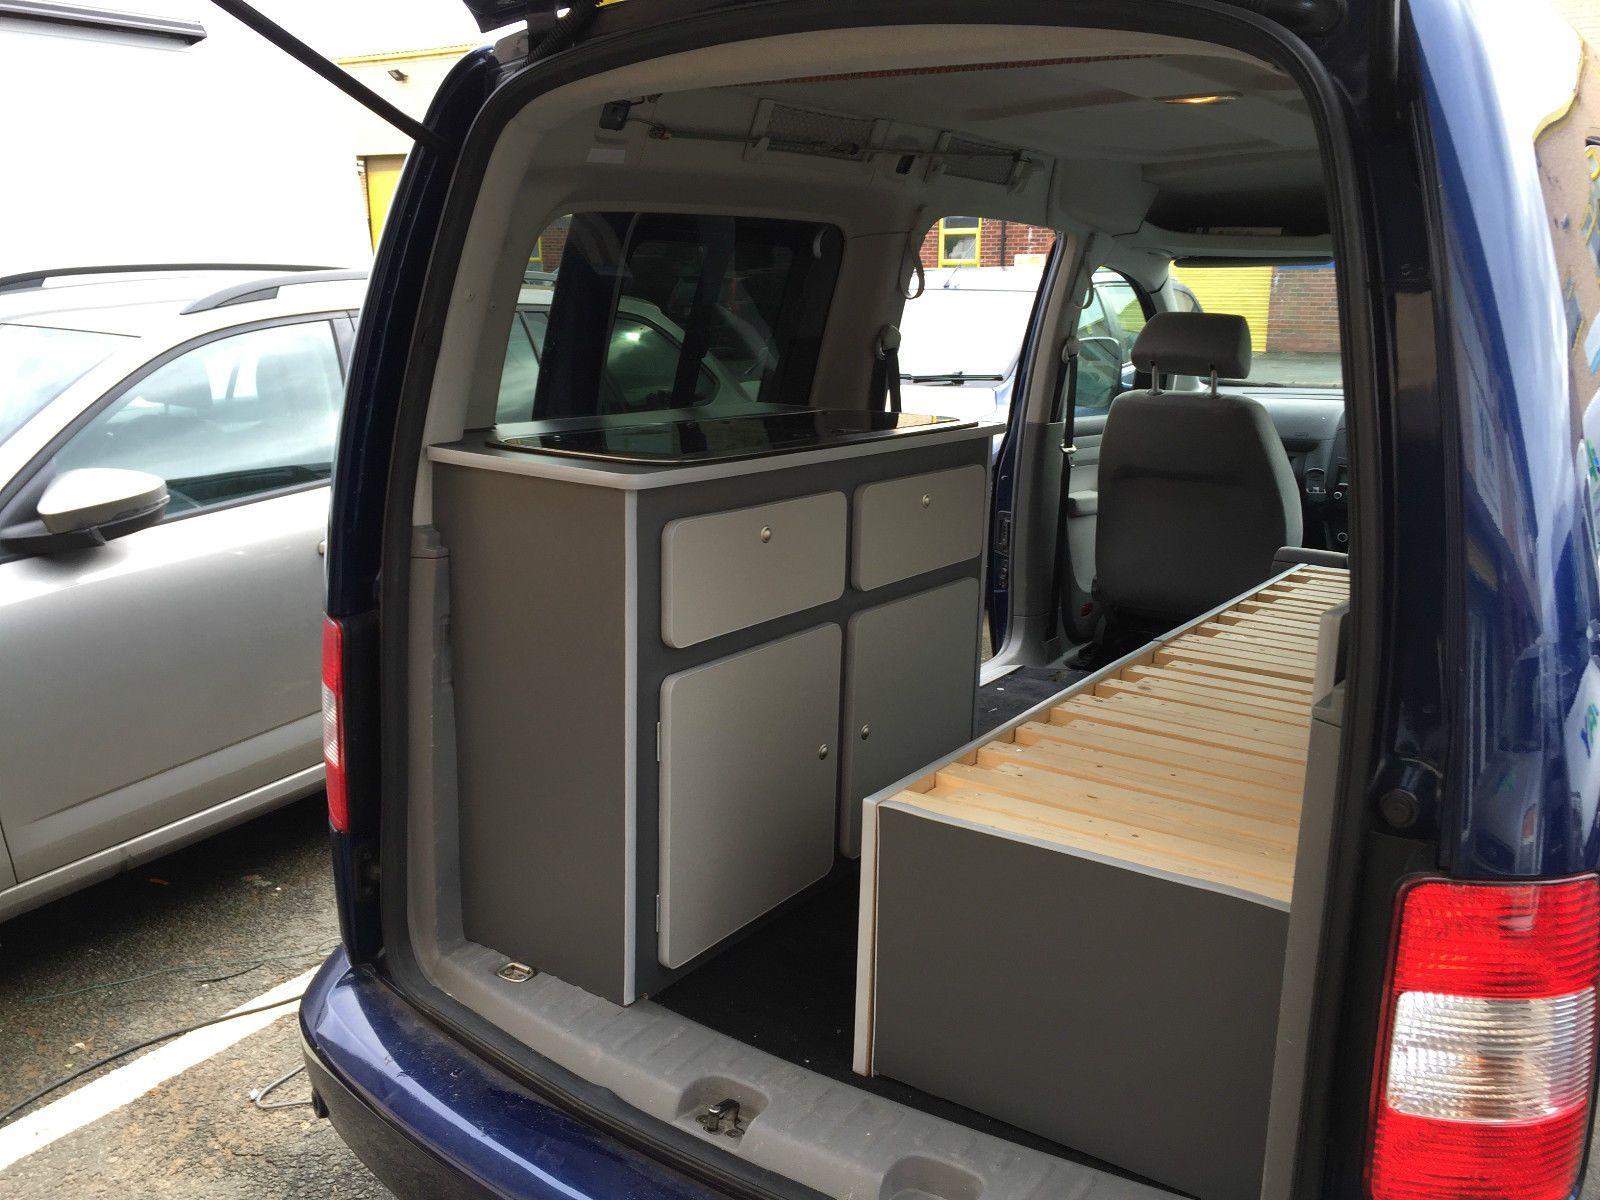 Fiat Doblo Vw Caddy Peugeot Partner Micro Campervan Conversion